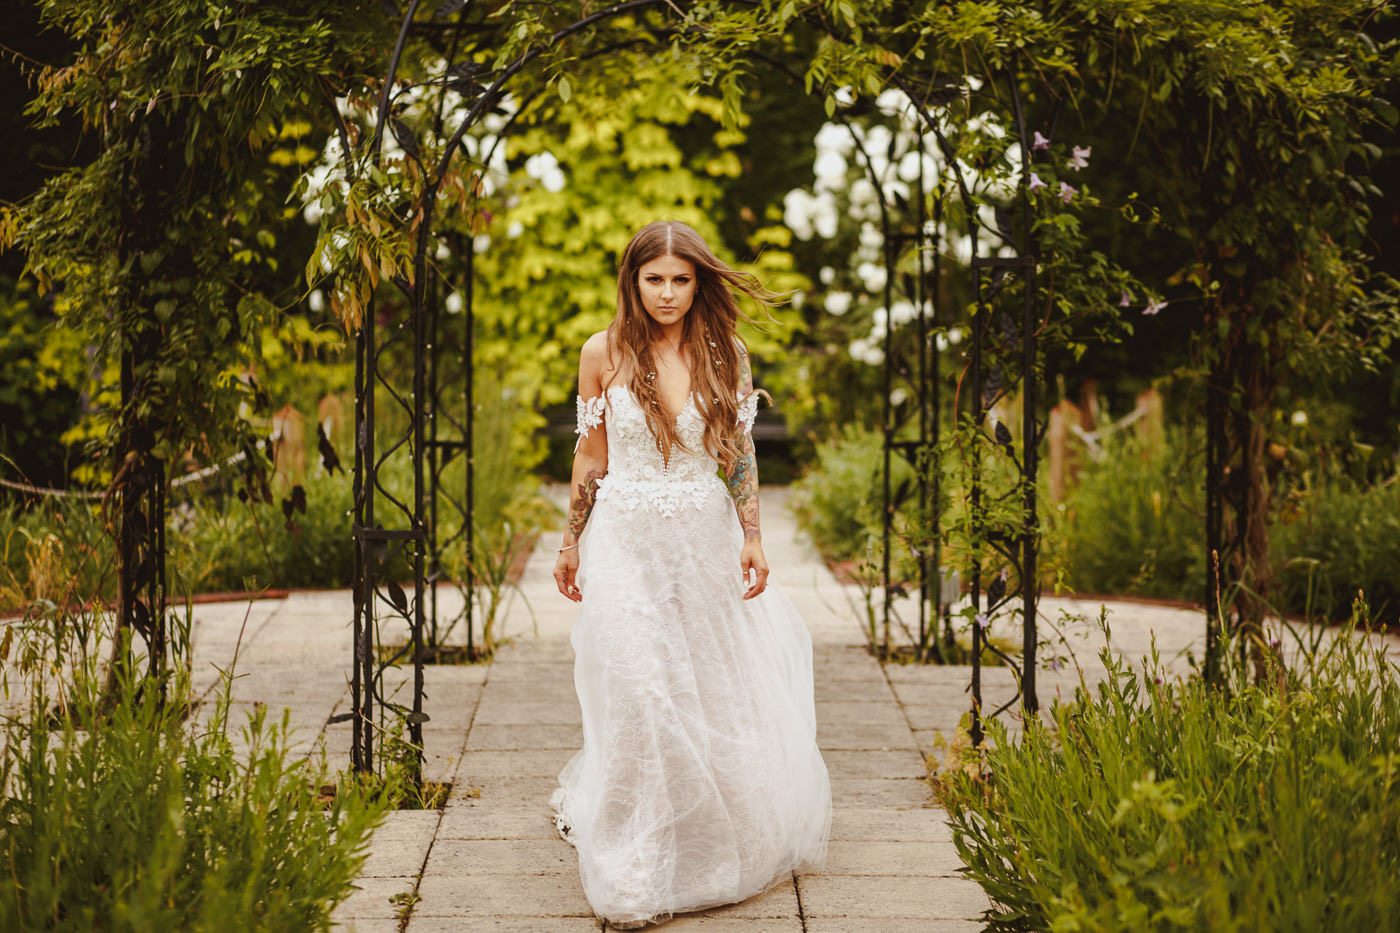 gaynes-park-wedding-photography-41.jpg